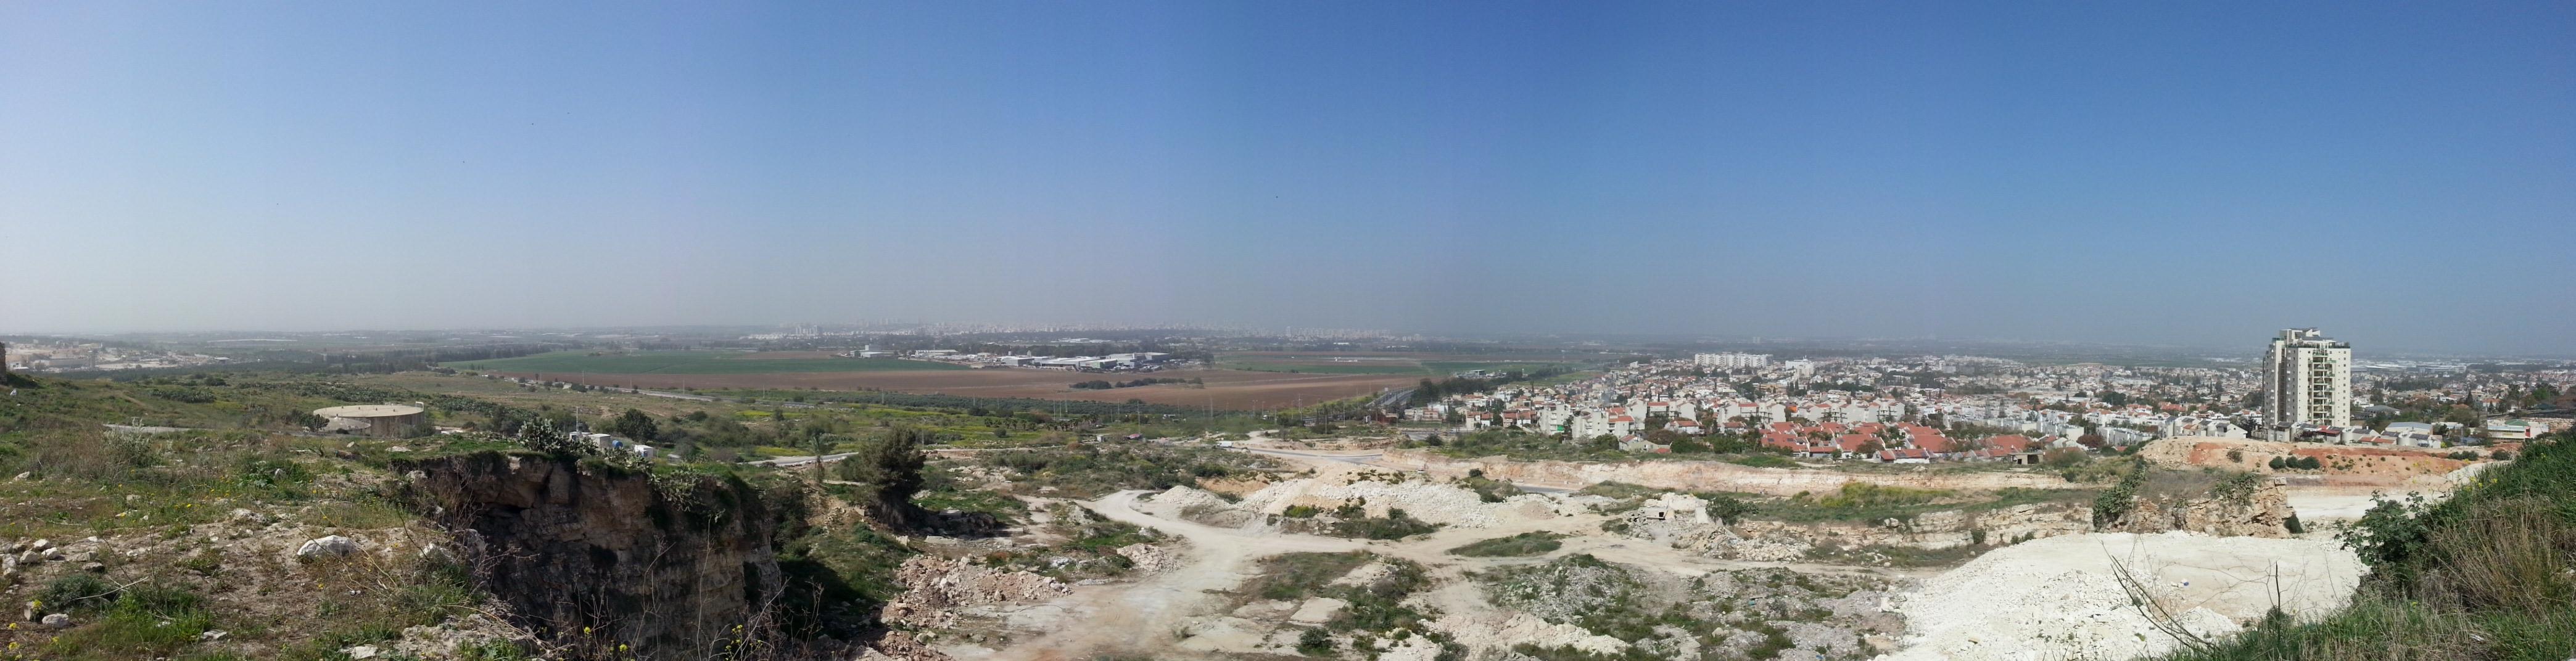 View from Izbet Sartah